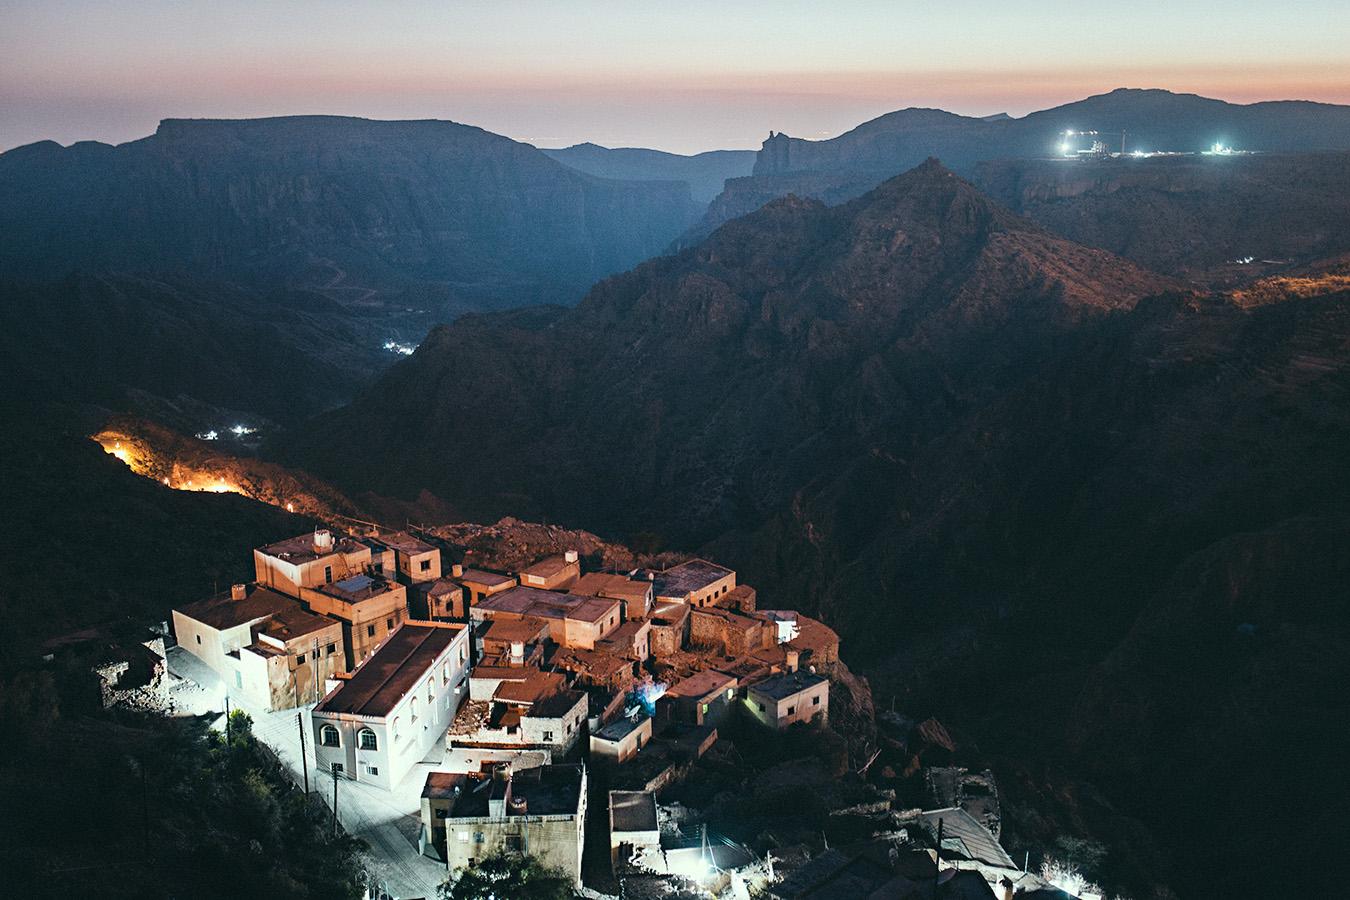 Punkt widokowy, Jabal Akhdar, Oman